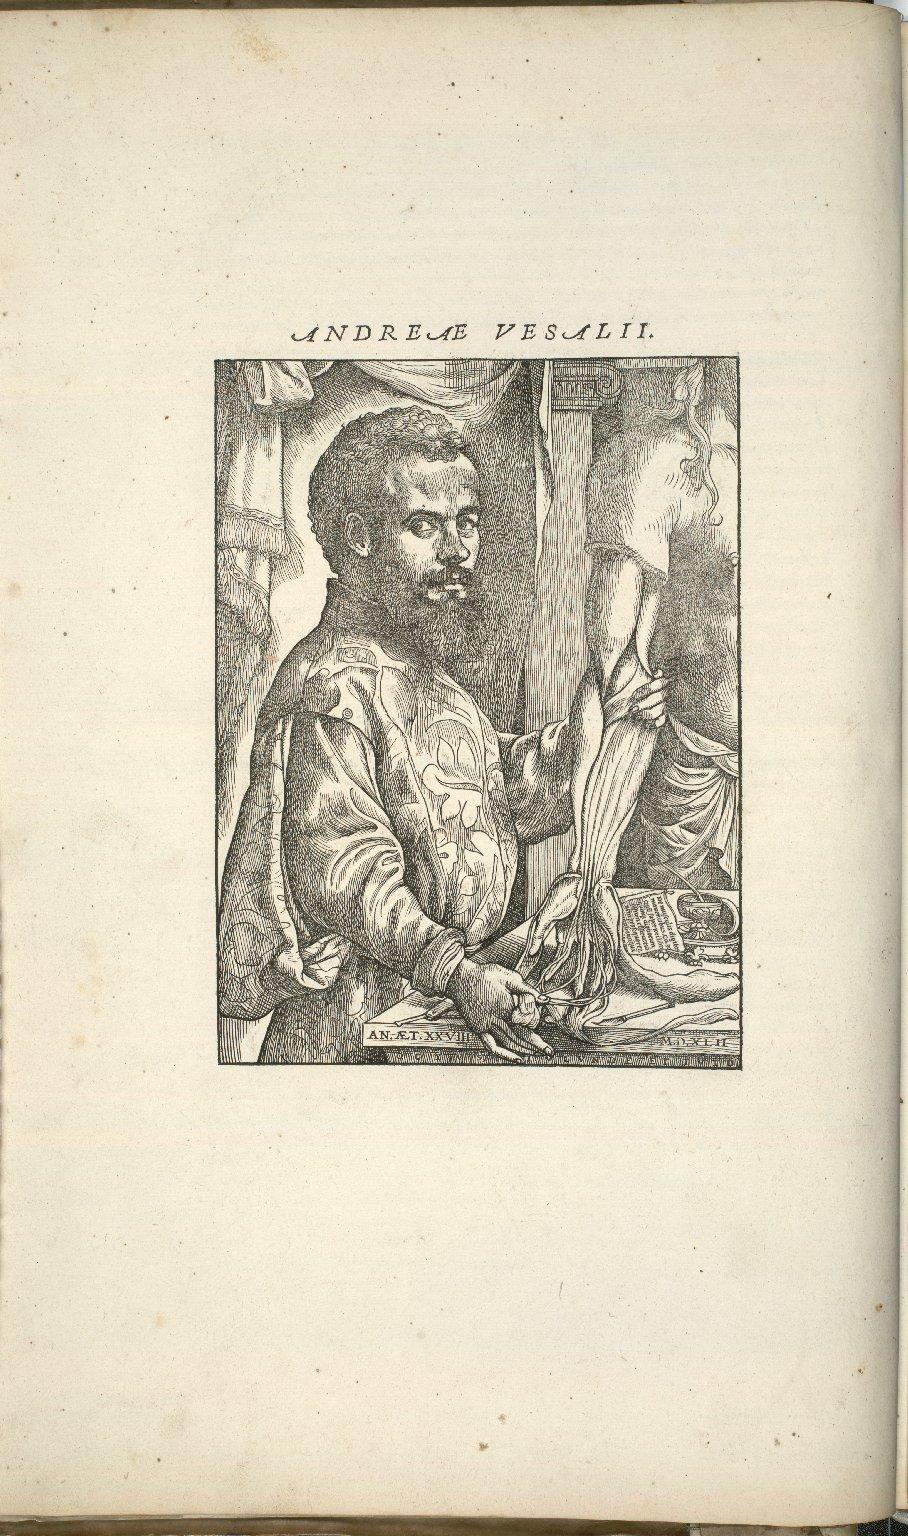 Andreae Vesalii